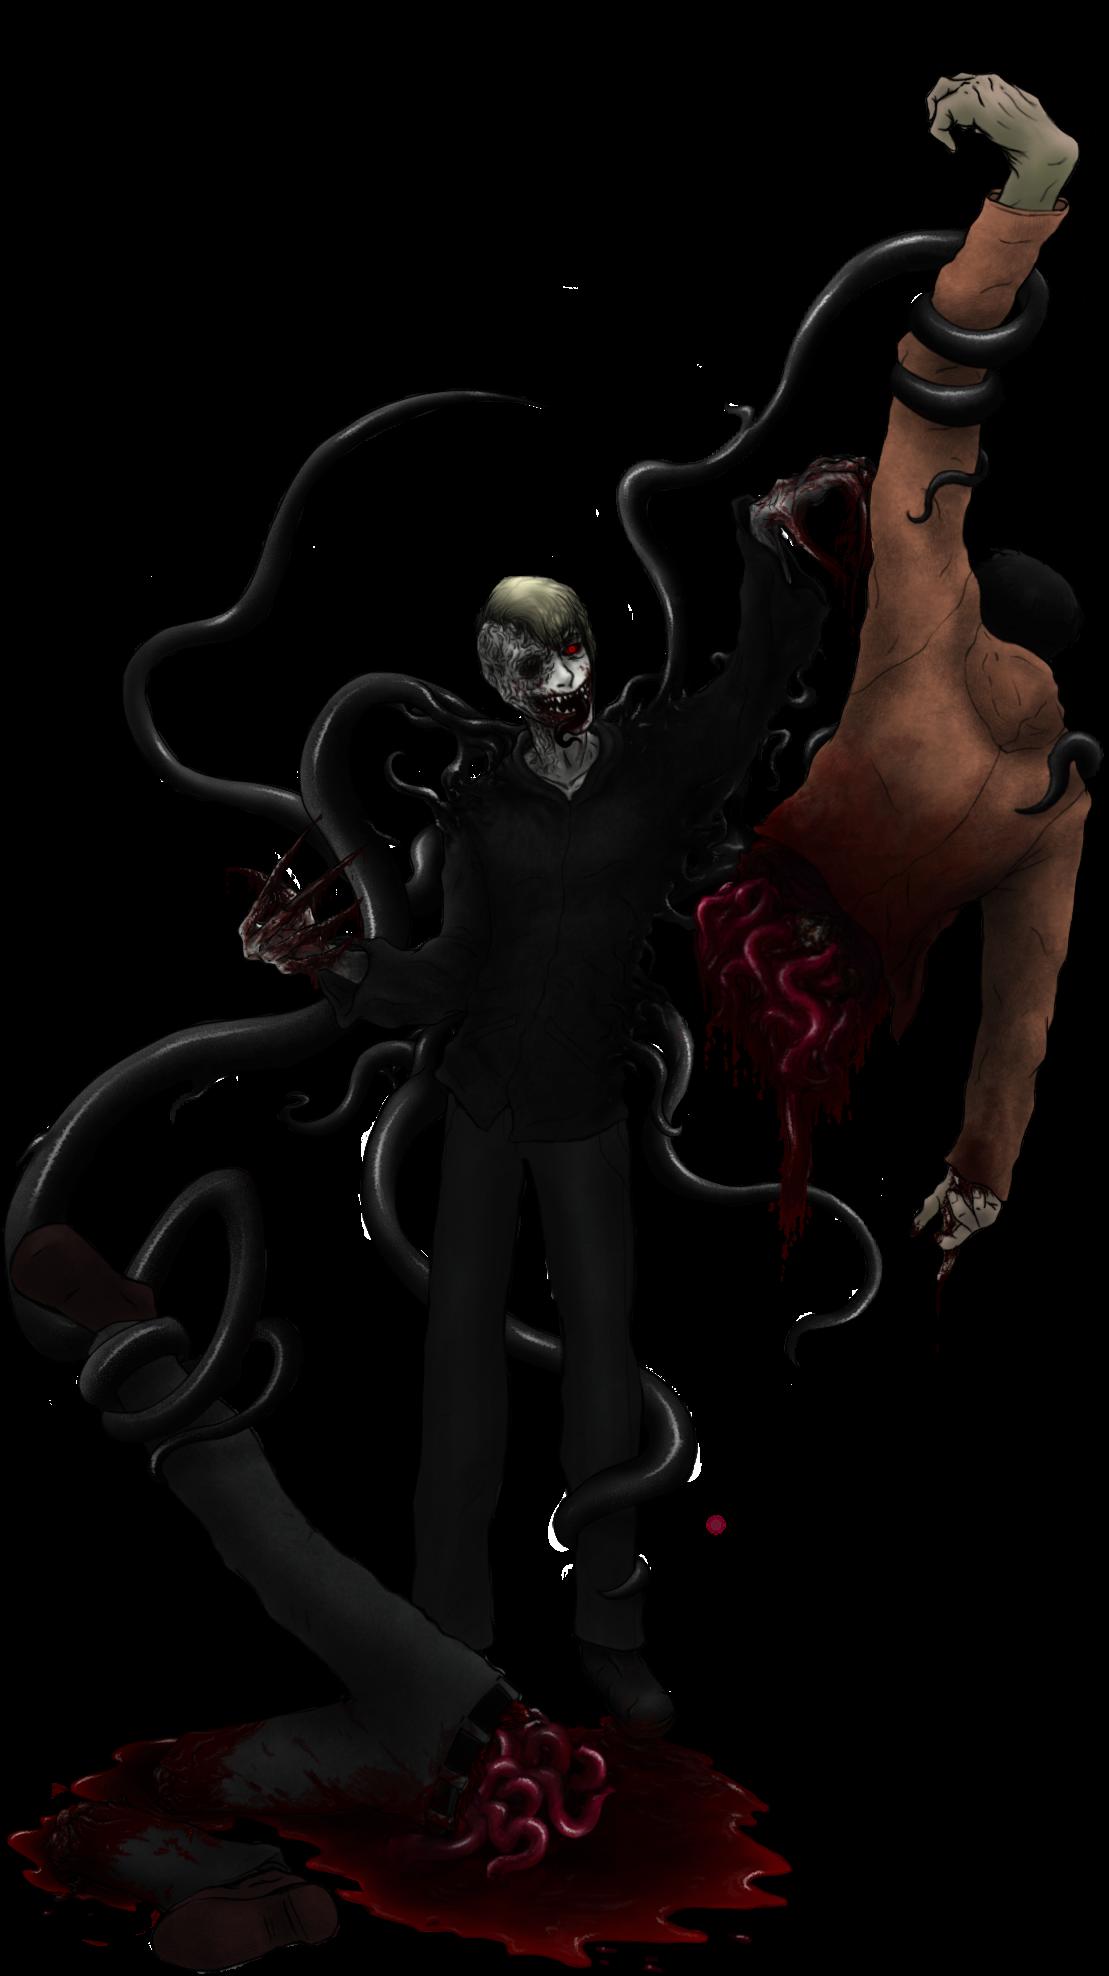 http://orig14.deviantart.net/9df5/f/2015/306/8/1/demon_gregor__dismemberment_by_lordplegeus-d9fapn4.png